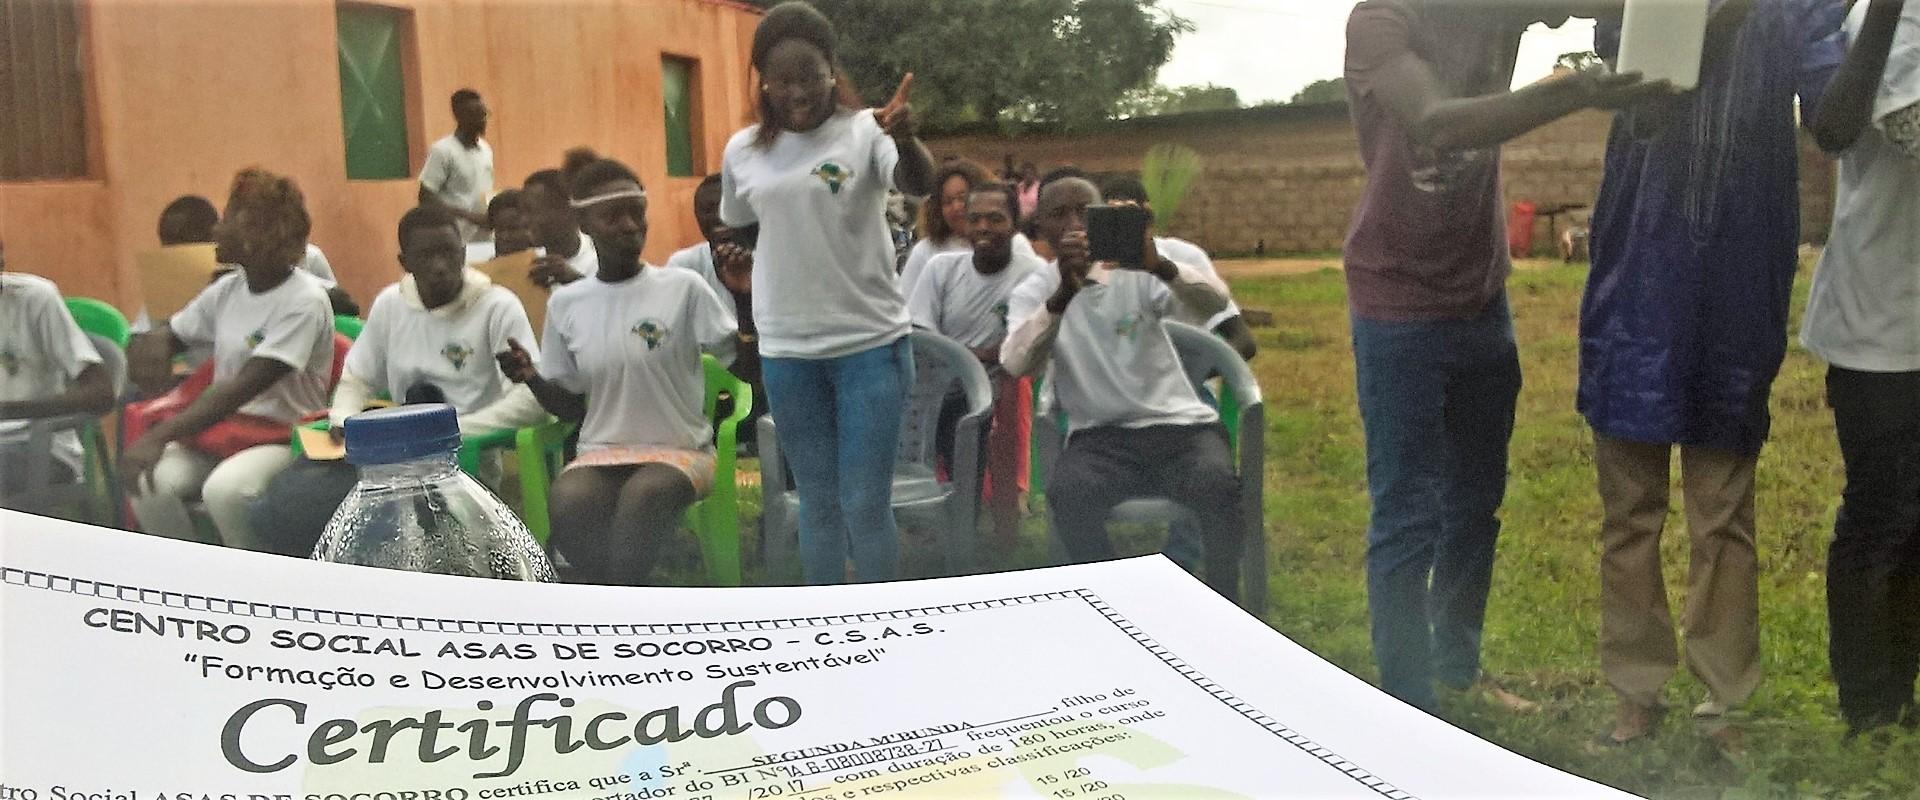 consegna 100 diplomi_guinea bissau_mani tese_2017